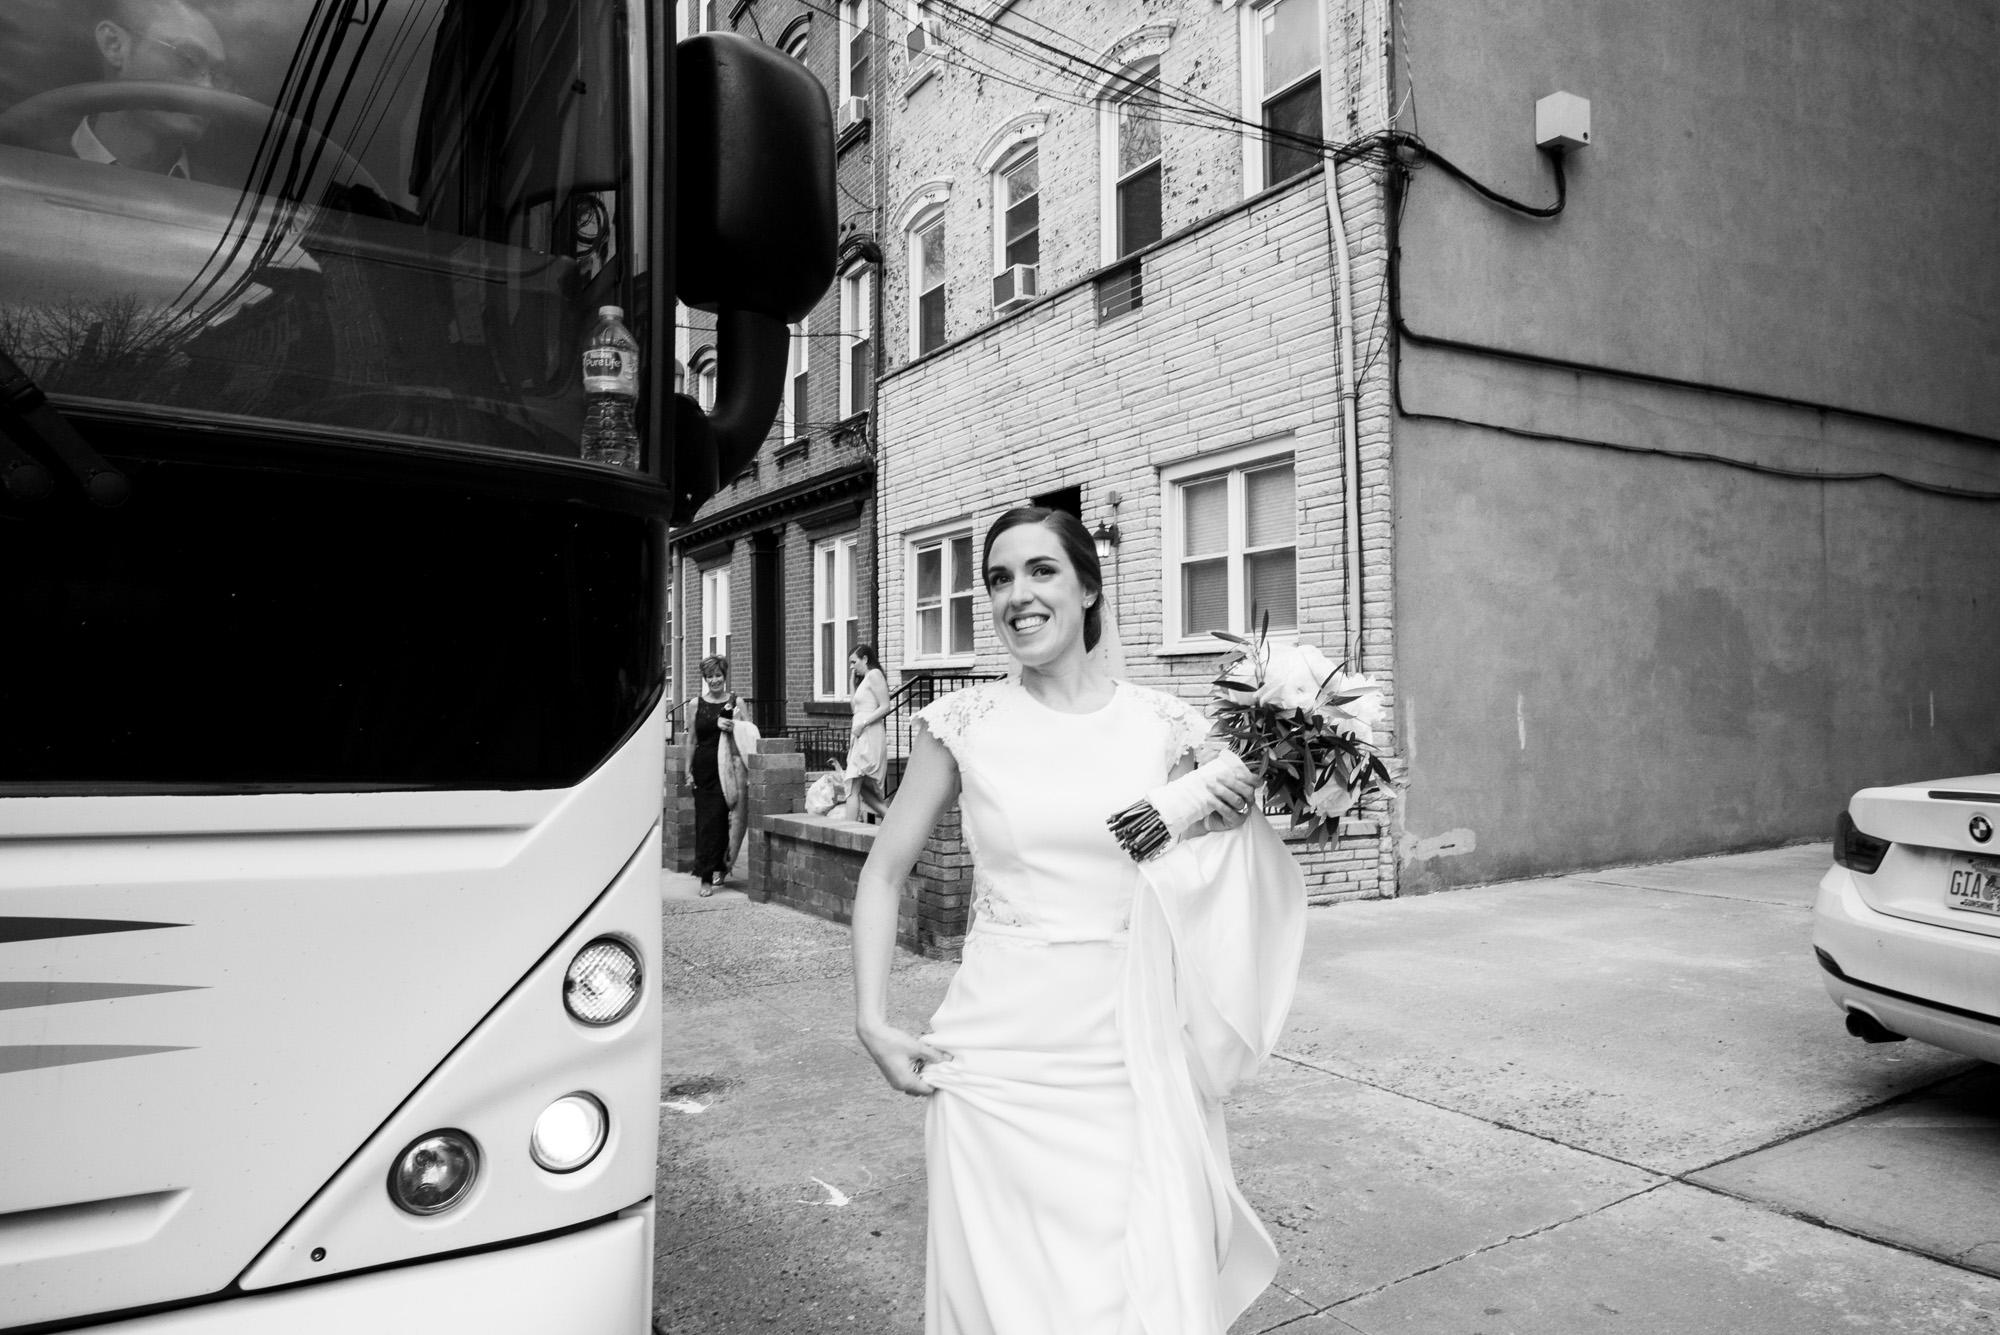 nj-wedding-photographer-maritime-parc-maria-david-13.jpg